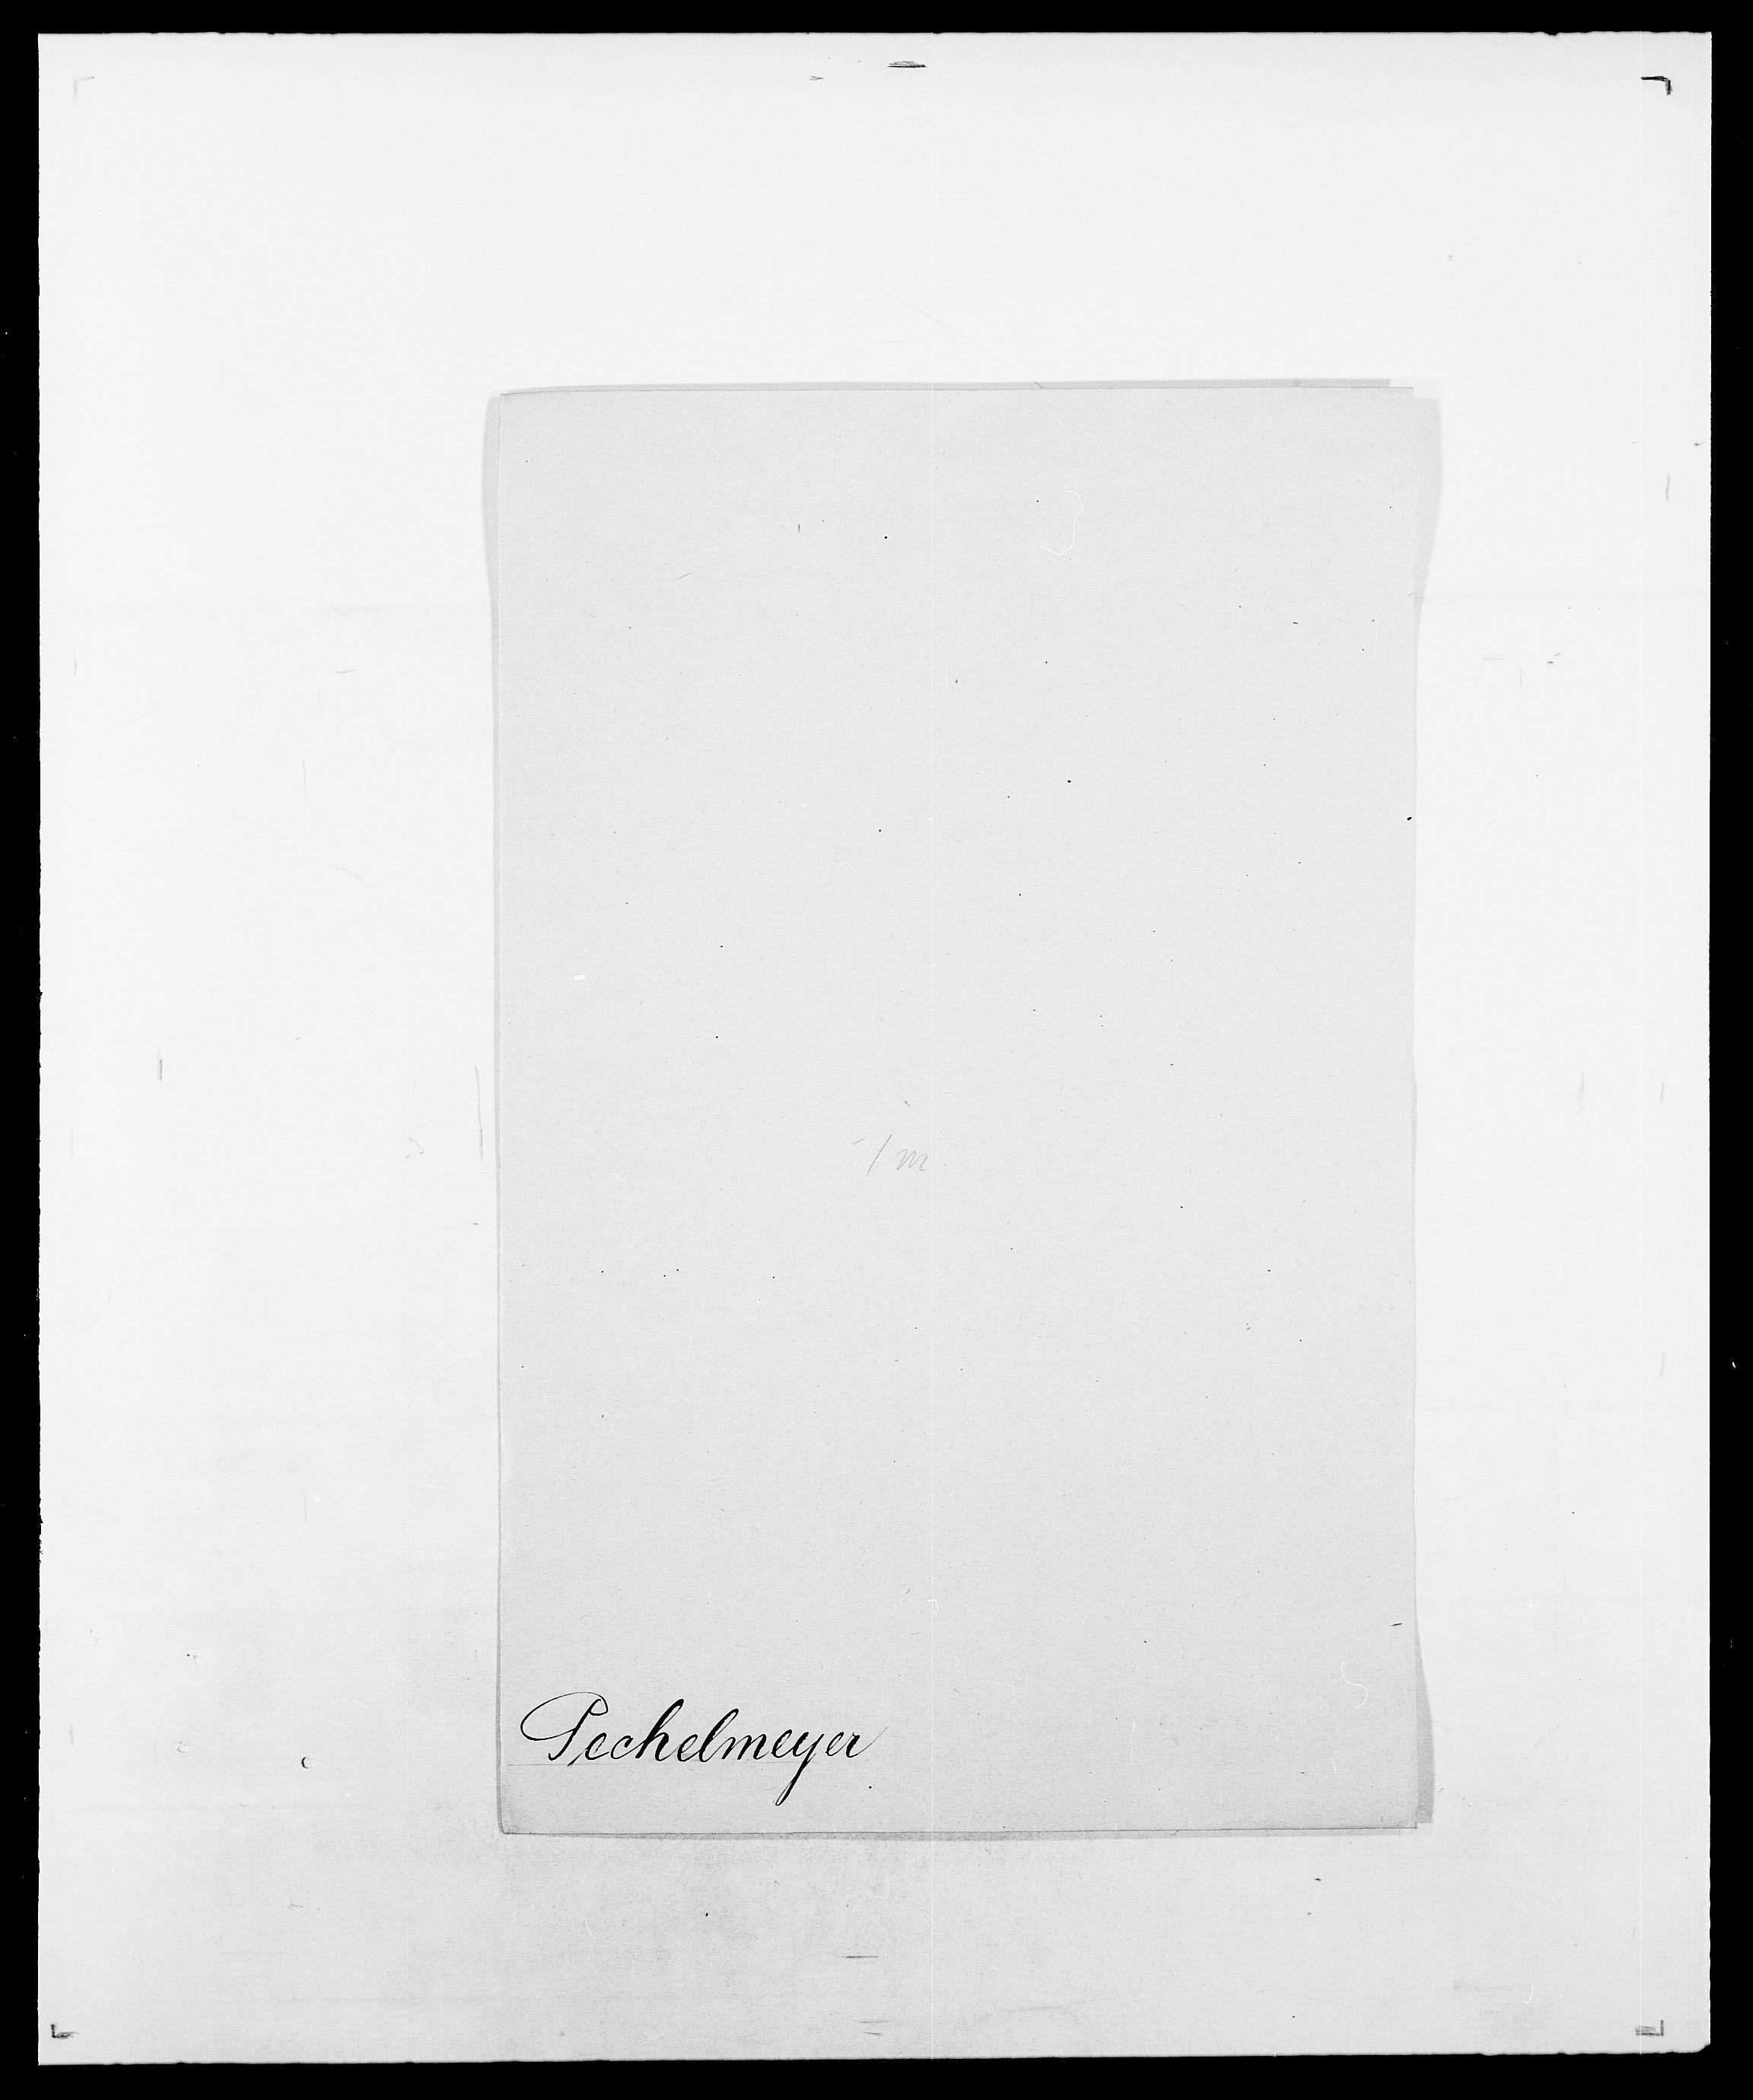 SAO, Delgobe, Charles Antoine - samling, D/Da/L0030: Paars - Pittelkov, s. 263